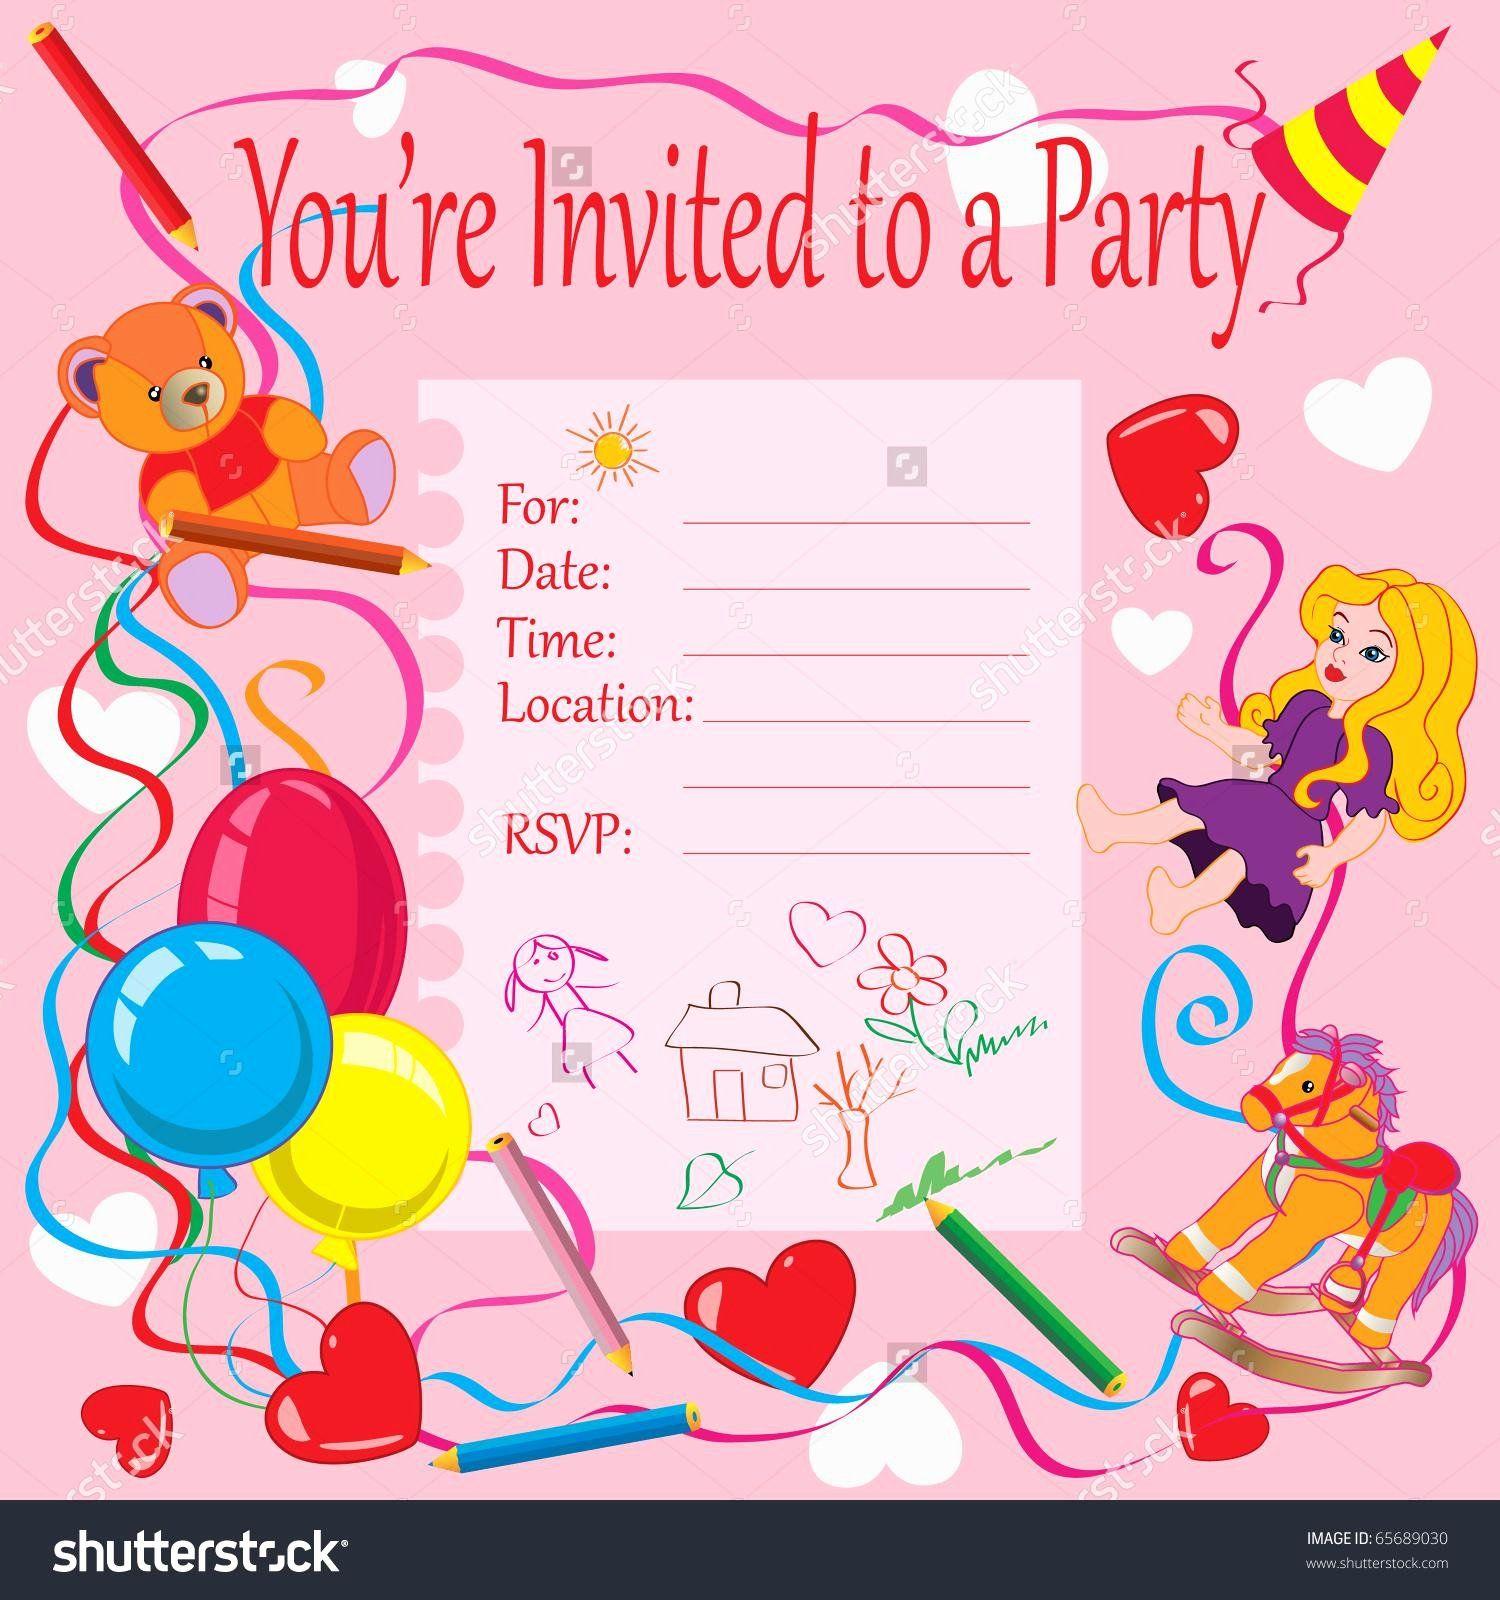 Birthday Card Invitation Template Best Of 20 Birthday Invitations Birthday Party Invitations Printable Invitation Card Birthday Kids Birthday Party Invitations